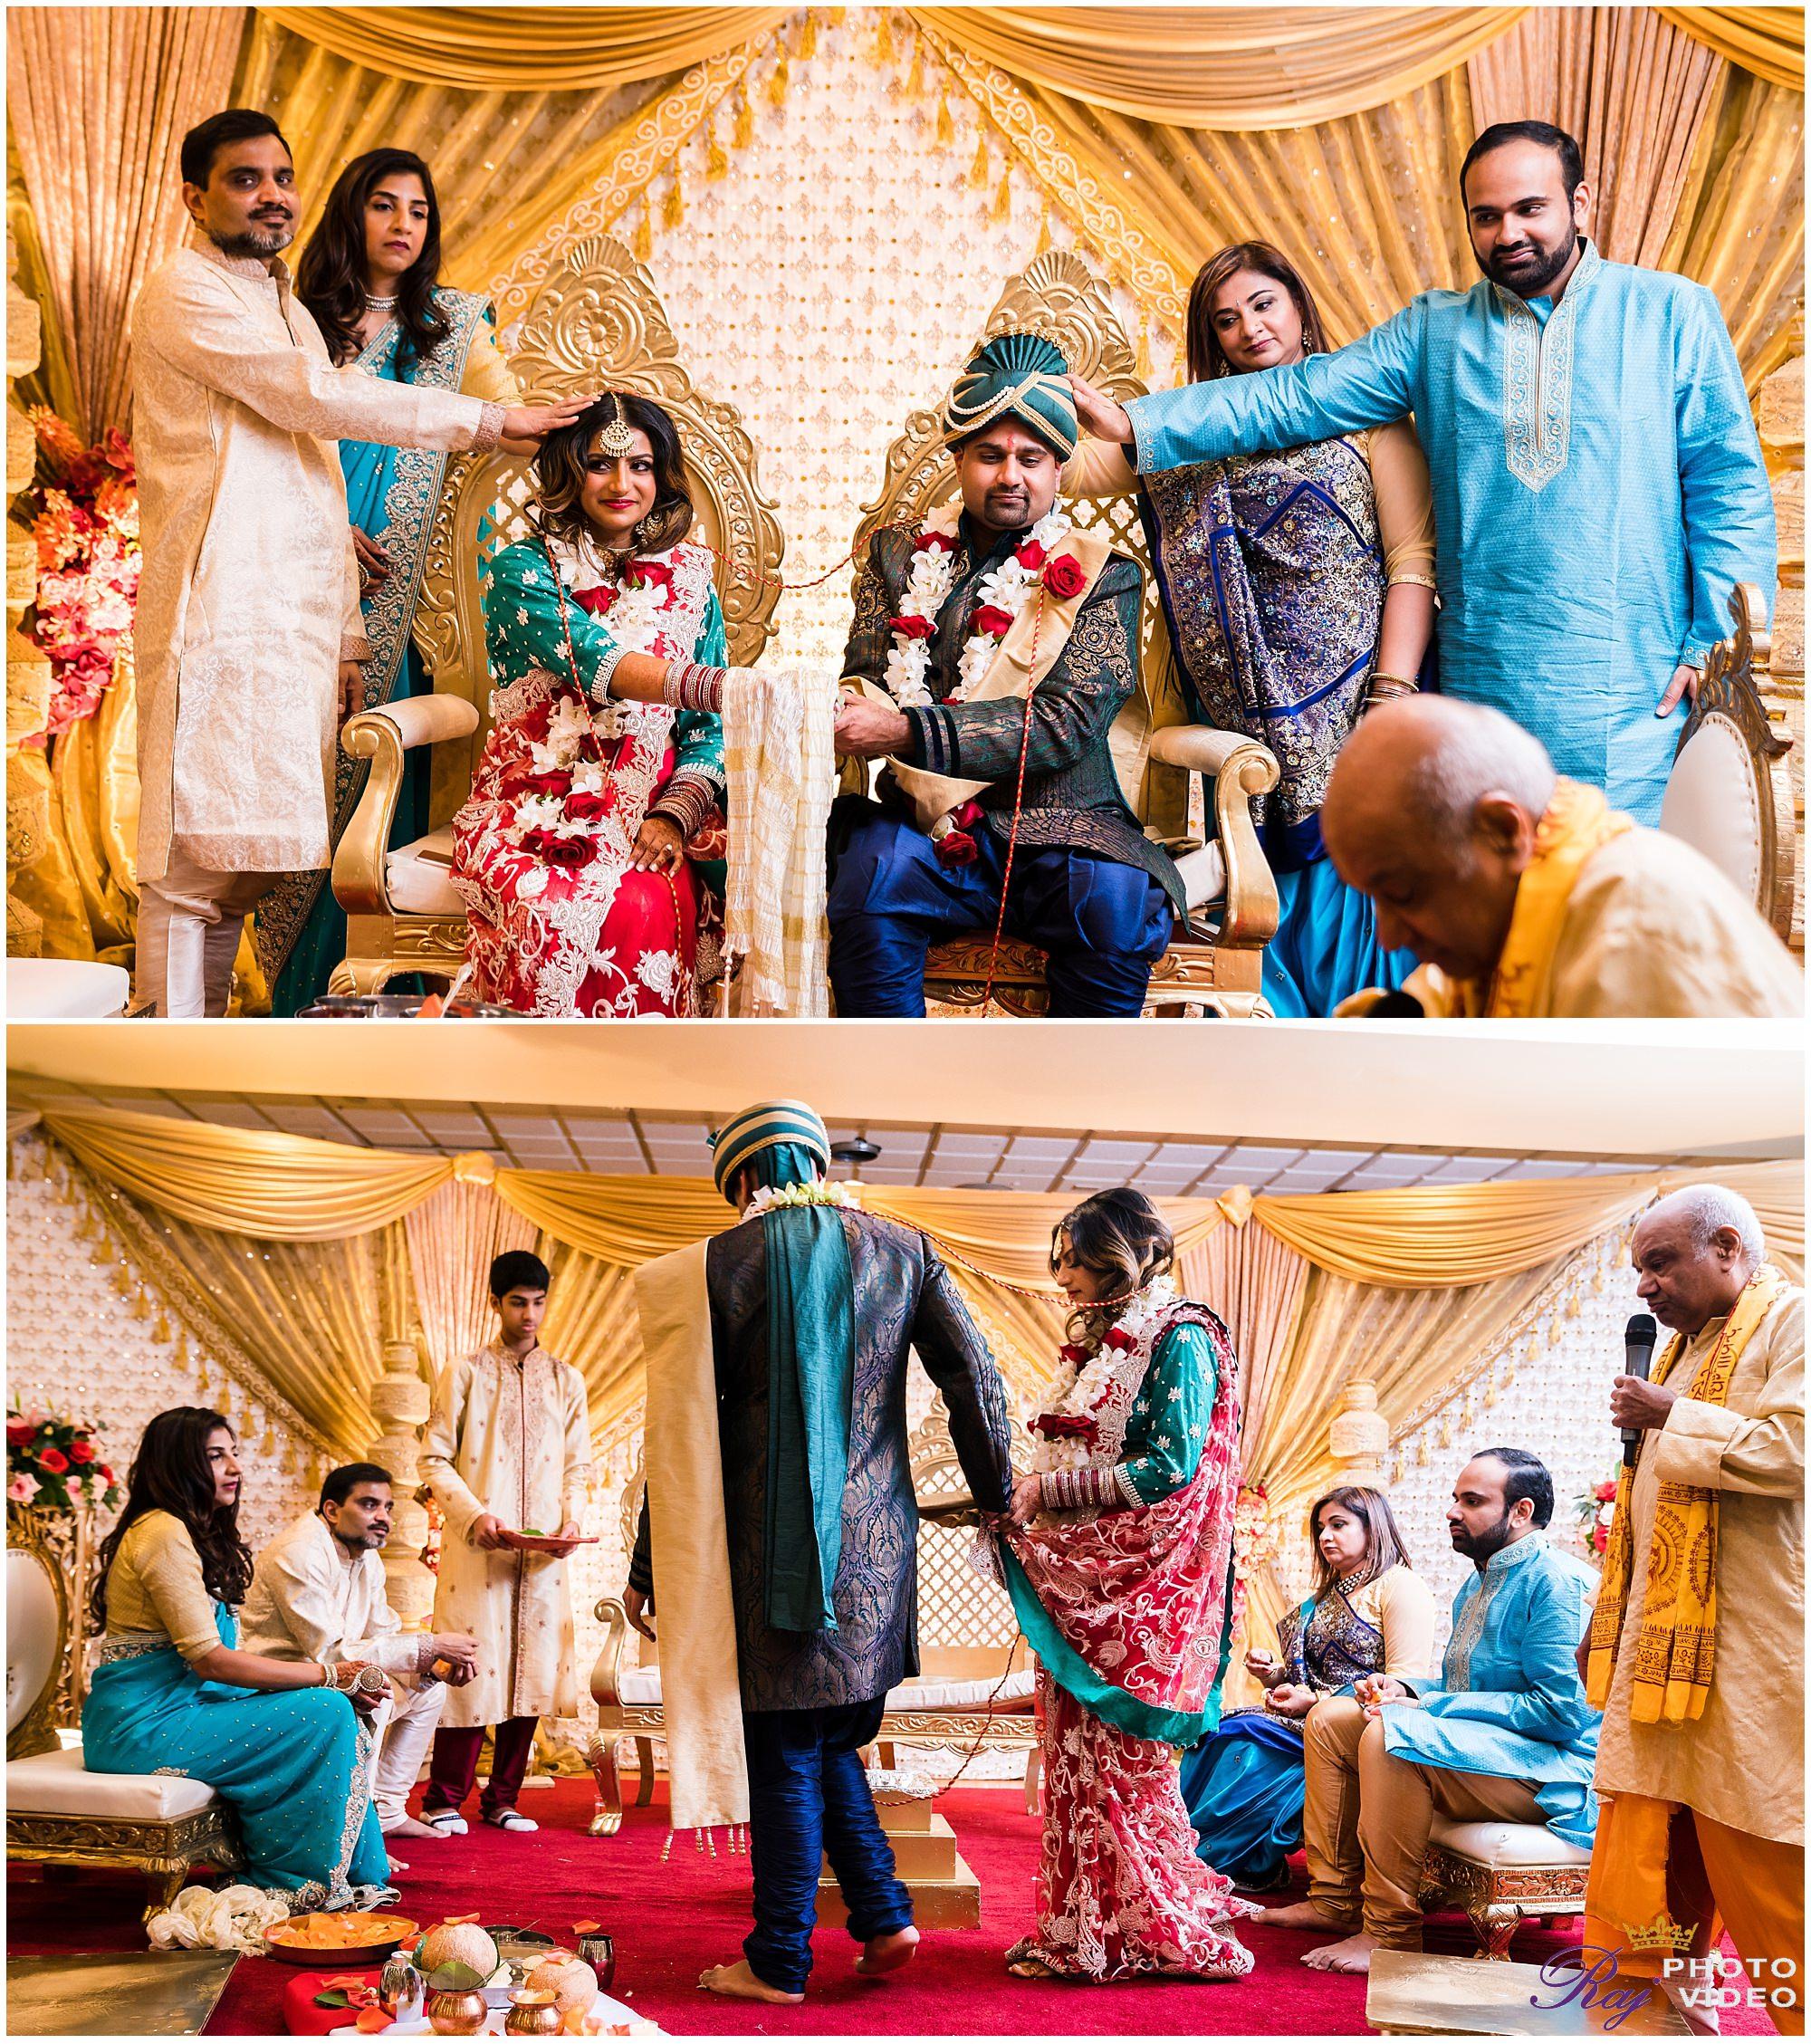 Sri-Guruvaayoorappan-Temple-Marlboro-NJ-Indian-Wedding-Chiyomi-Scott-00021.jpg